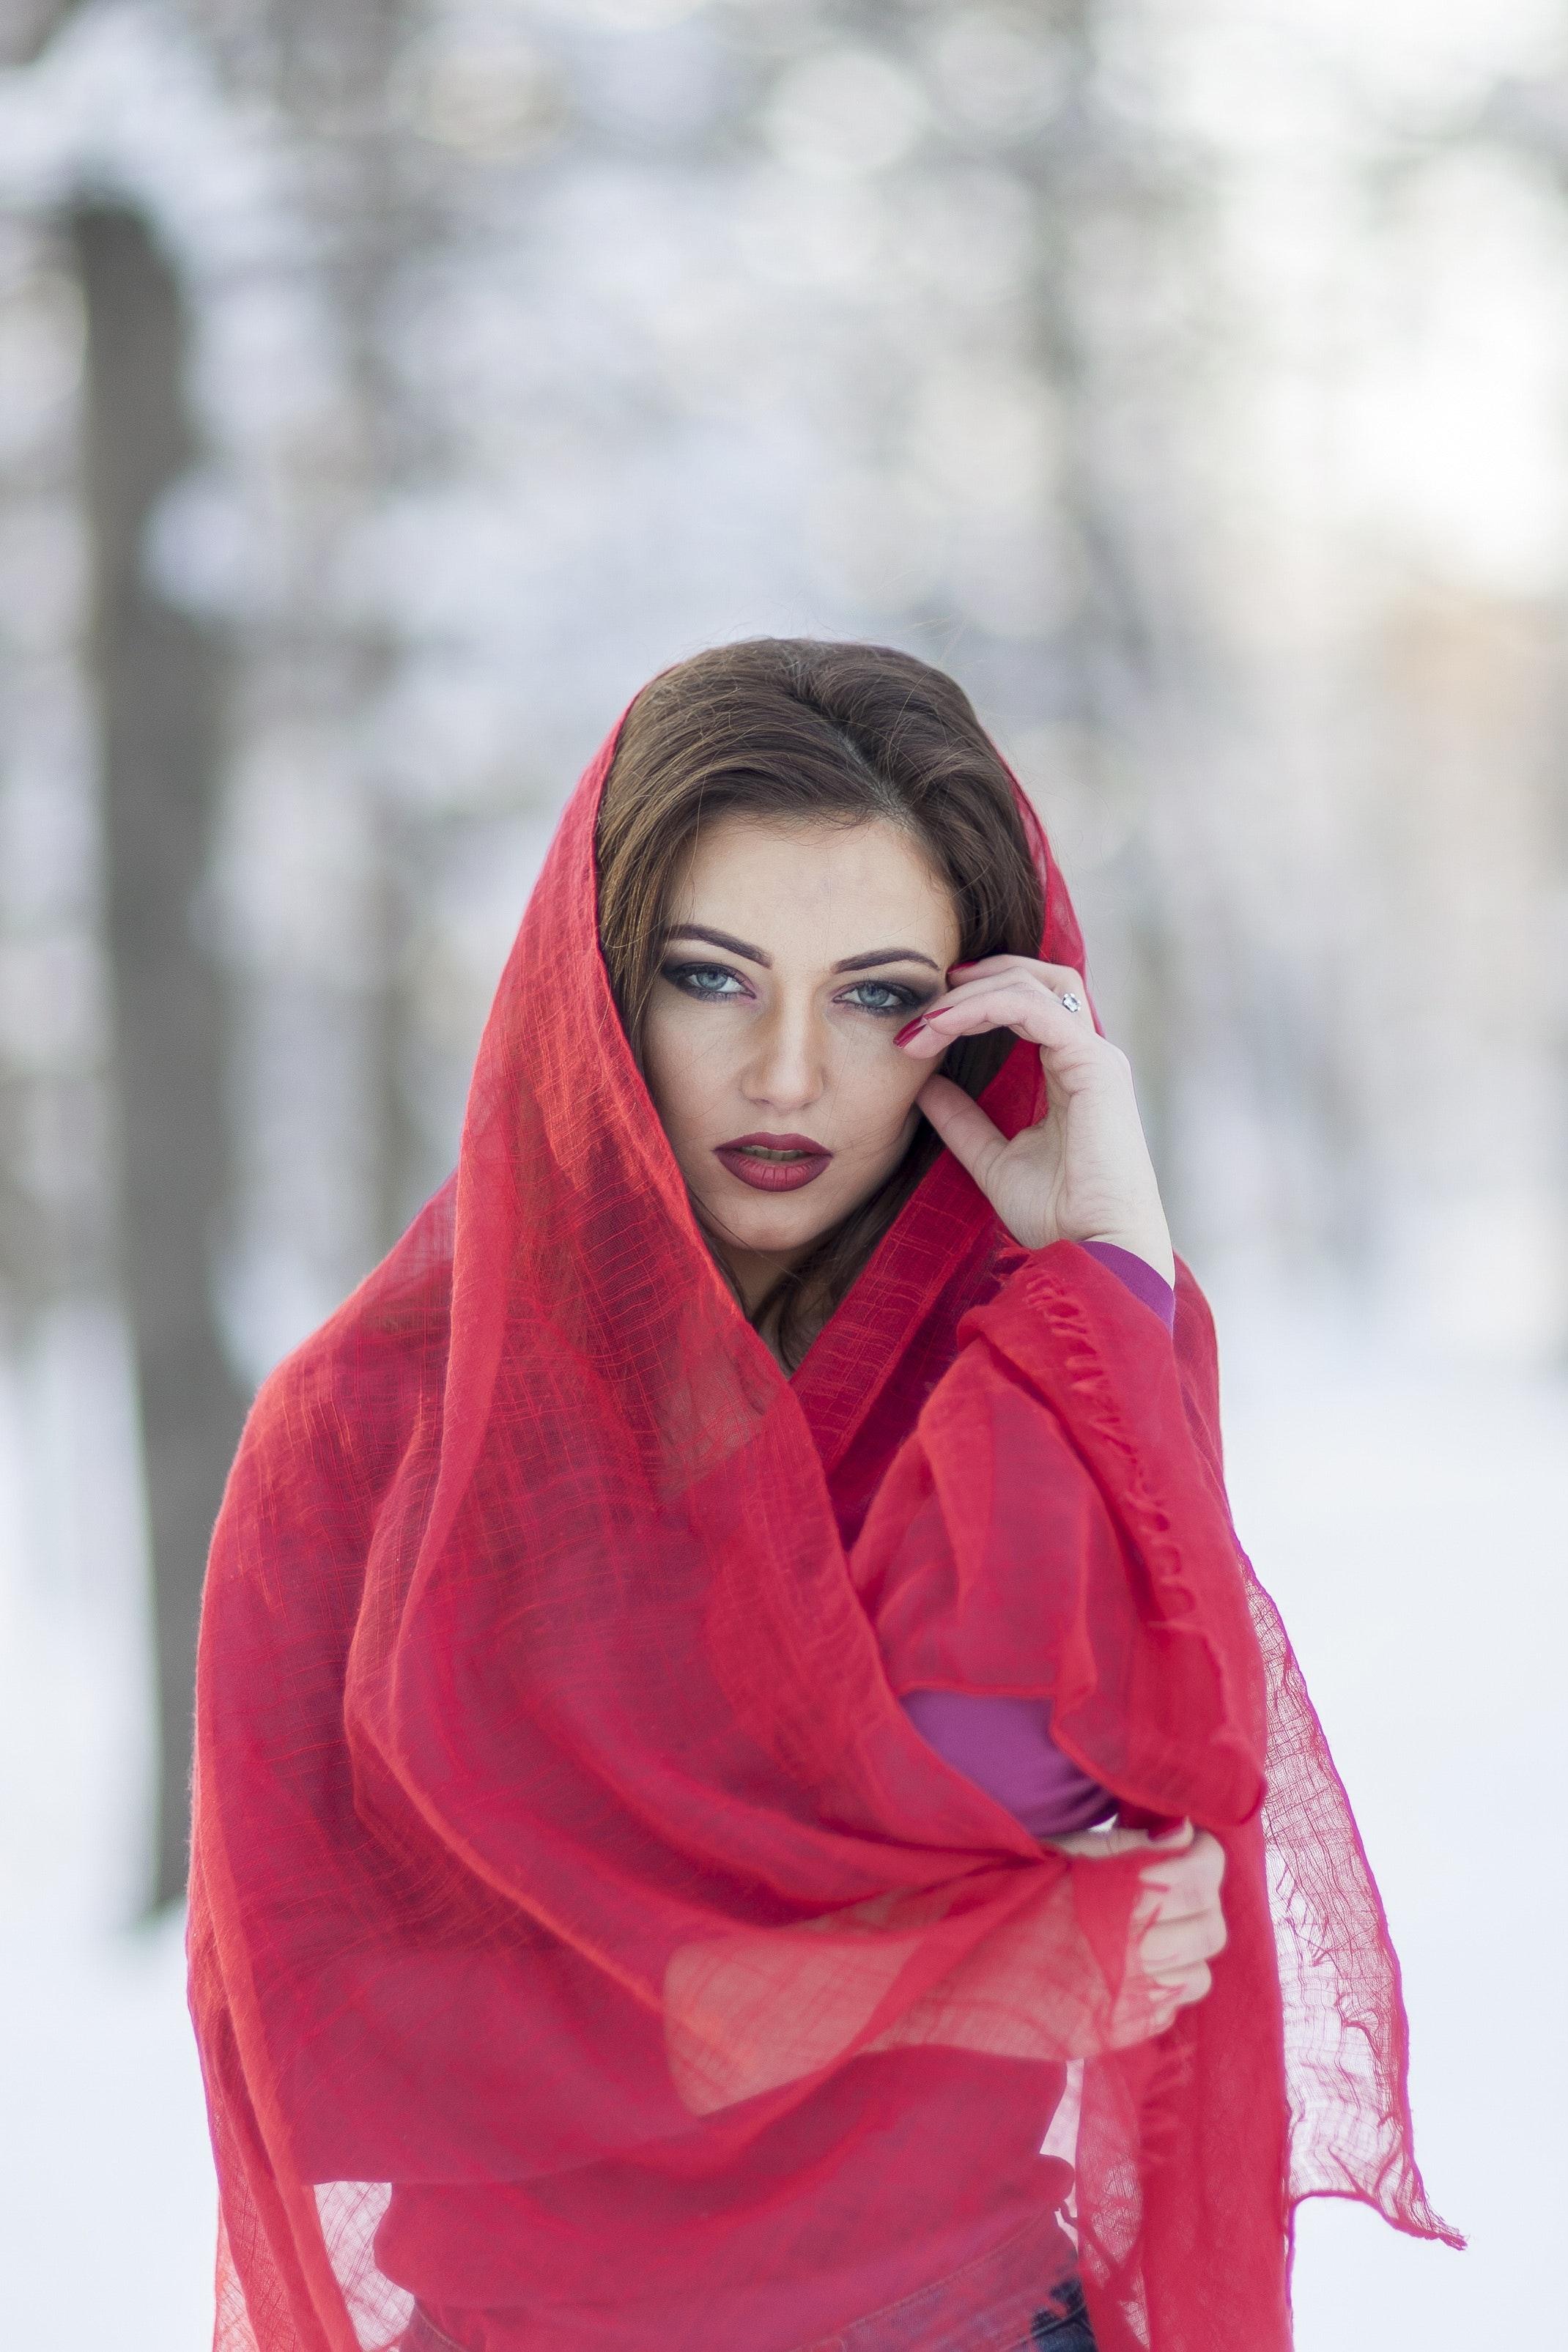 14ba406933e 1000+ Beautiful Glamour Photos · Pexels · Free Stock Photos